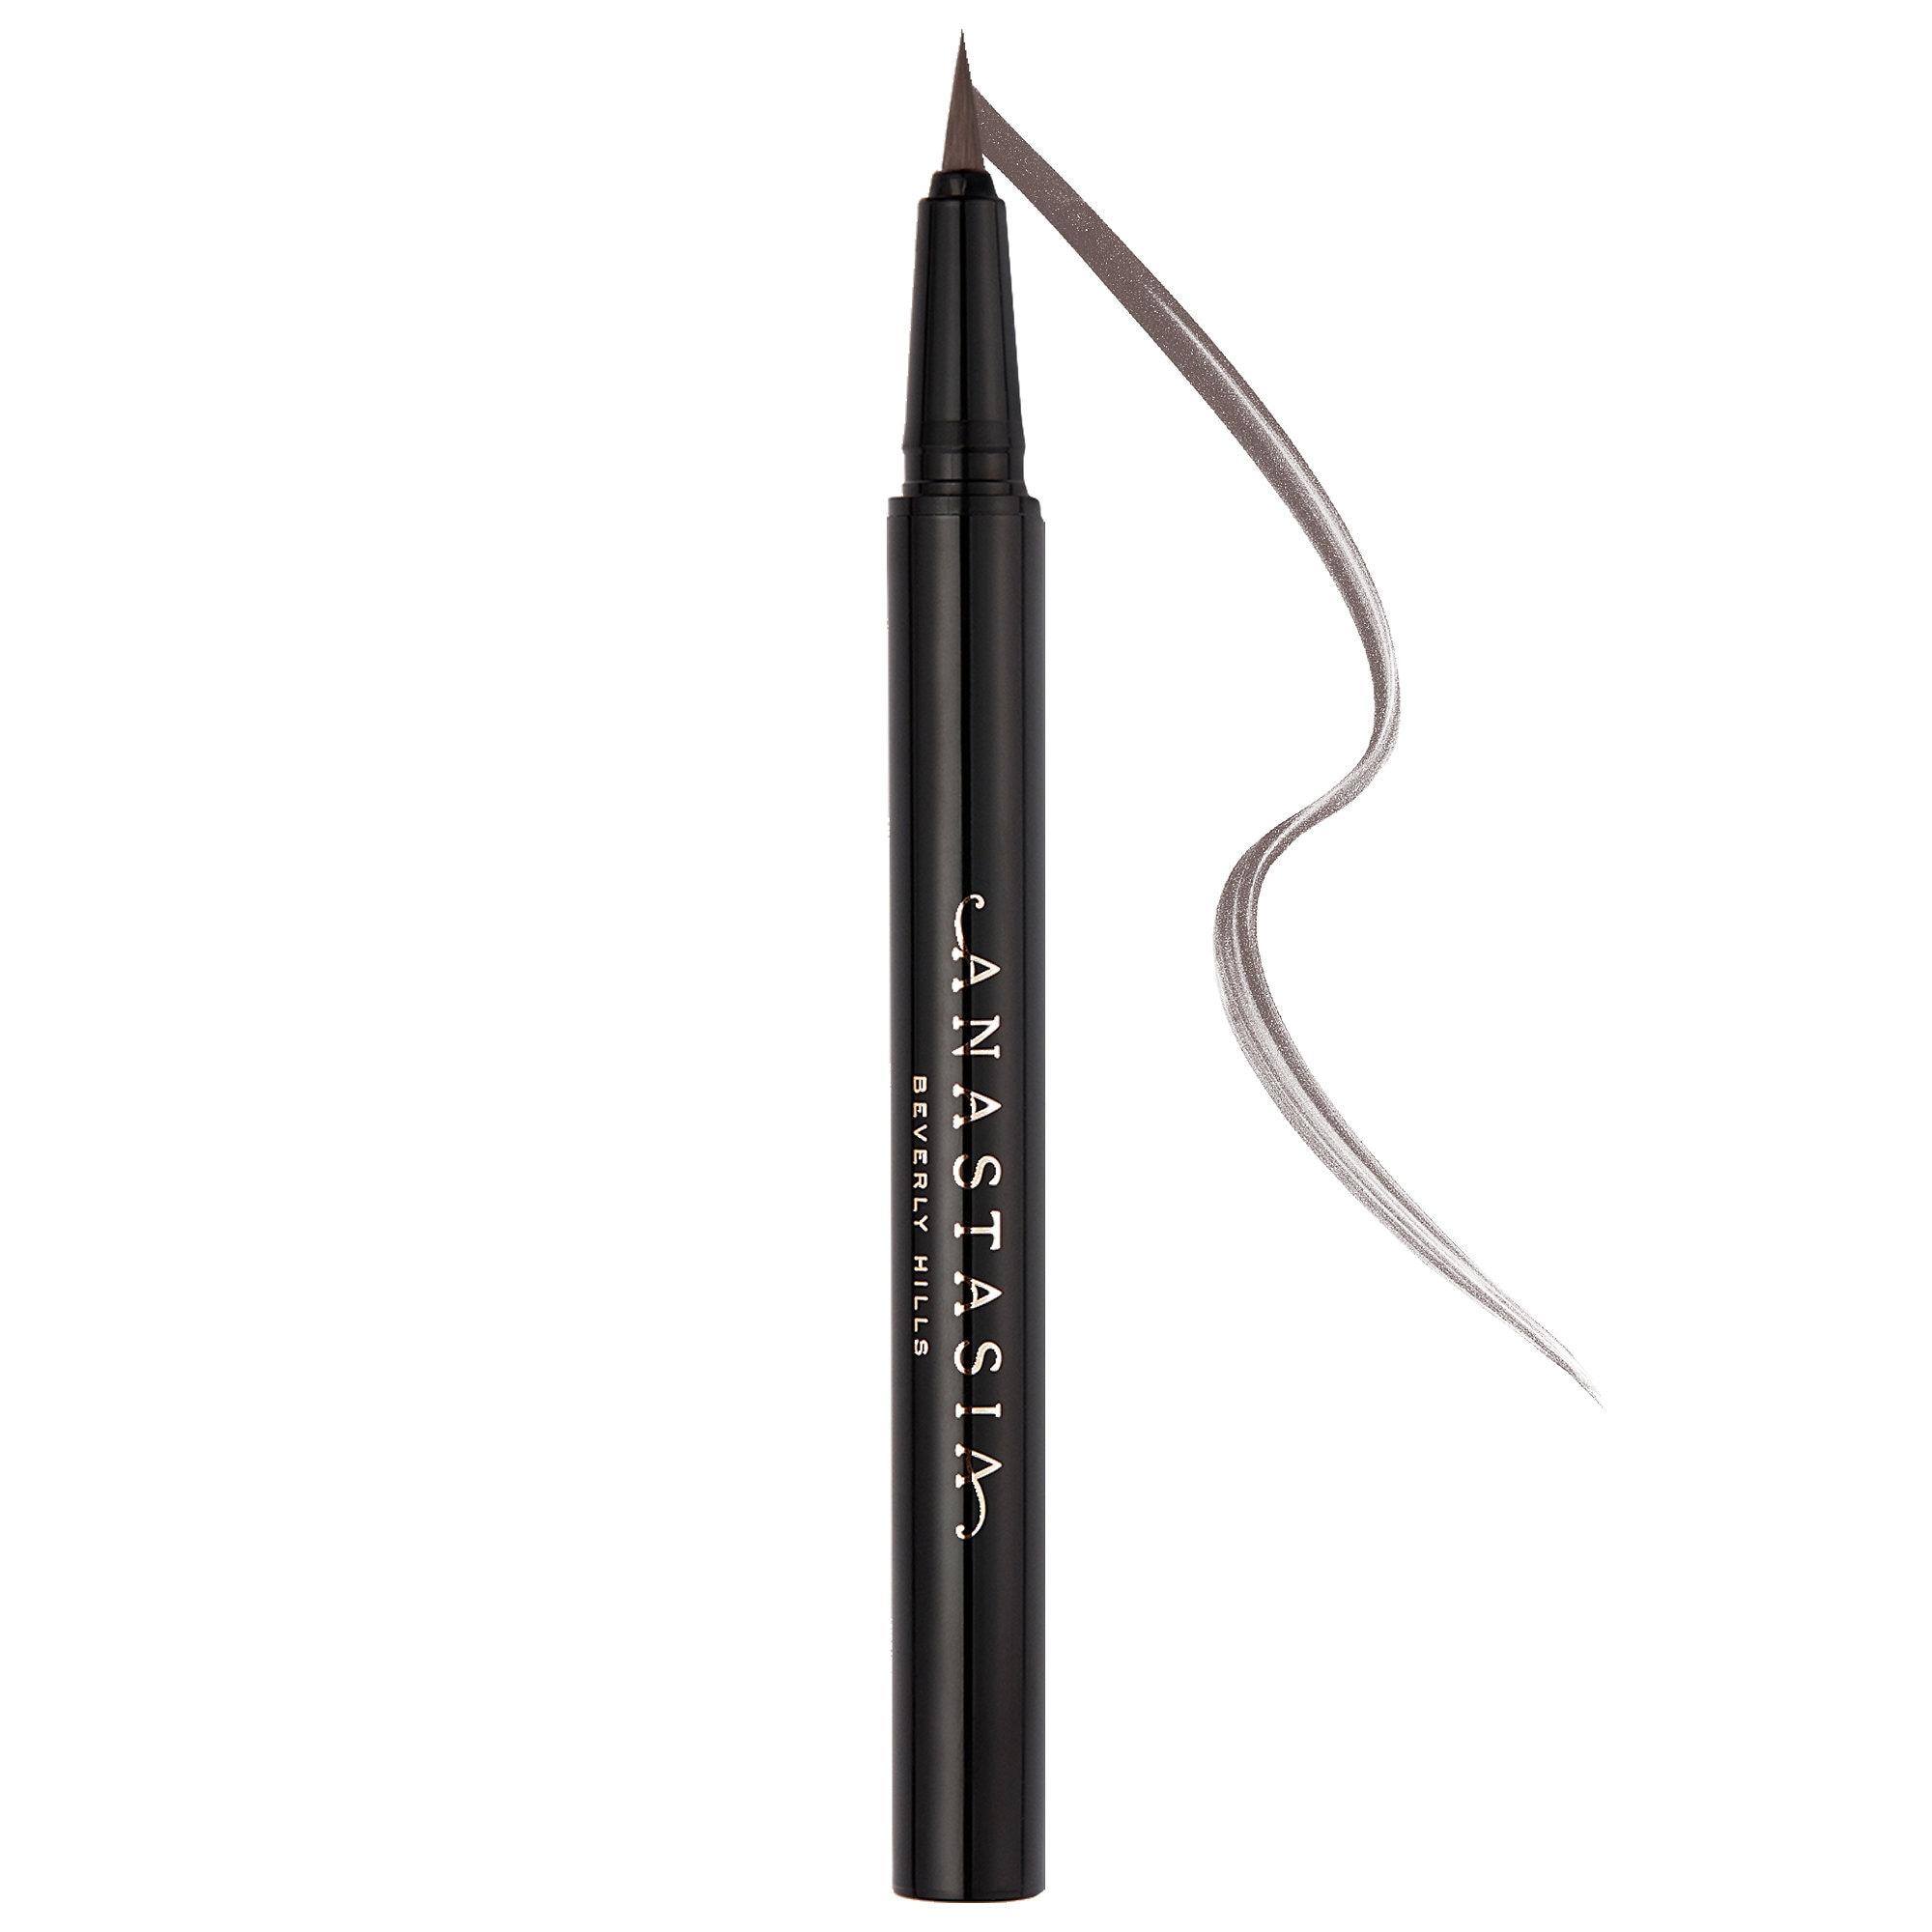 Anastasia Beverly Hills - Micro-Stroking Detailing Brow Pen